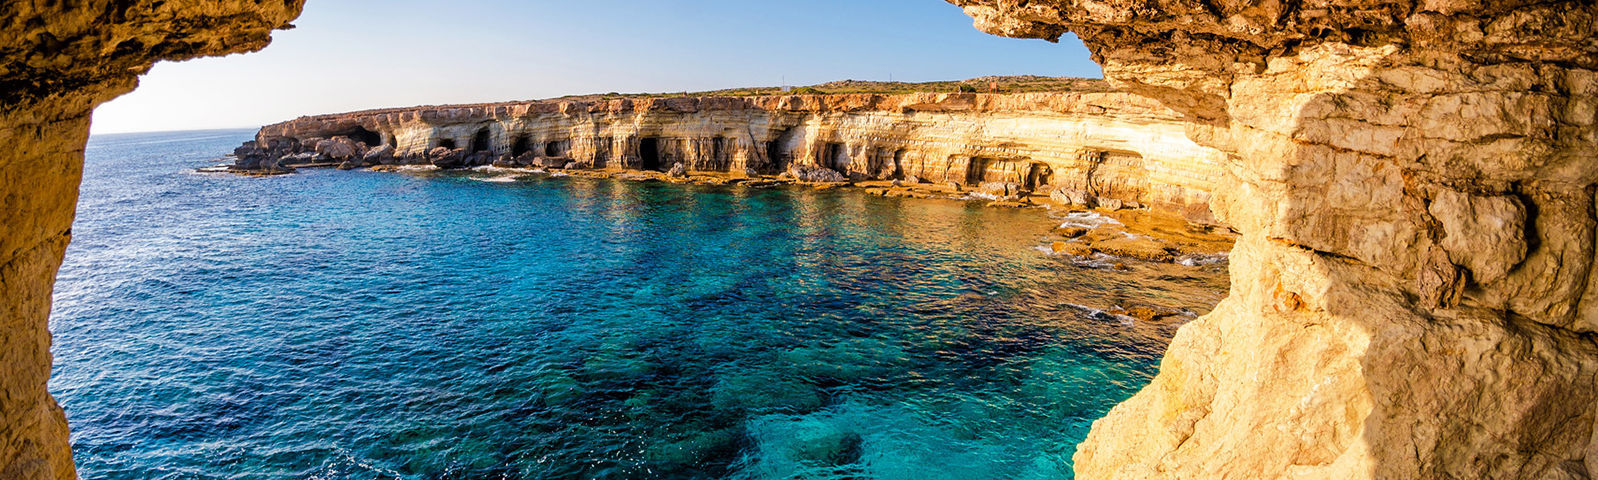 Carte Ign Chypre.Chypre Guide De Voyage Chypre Routard Com